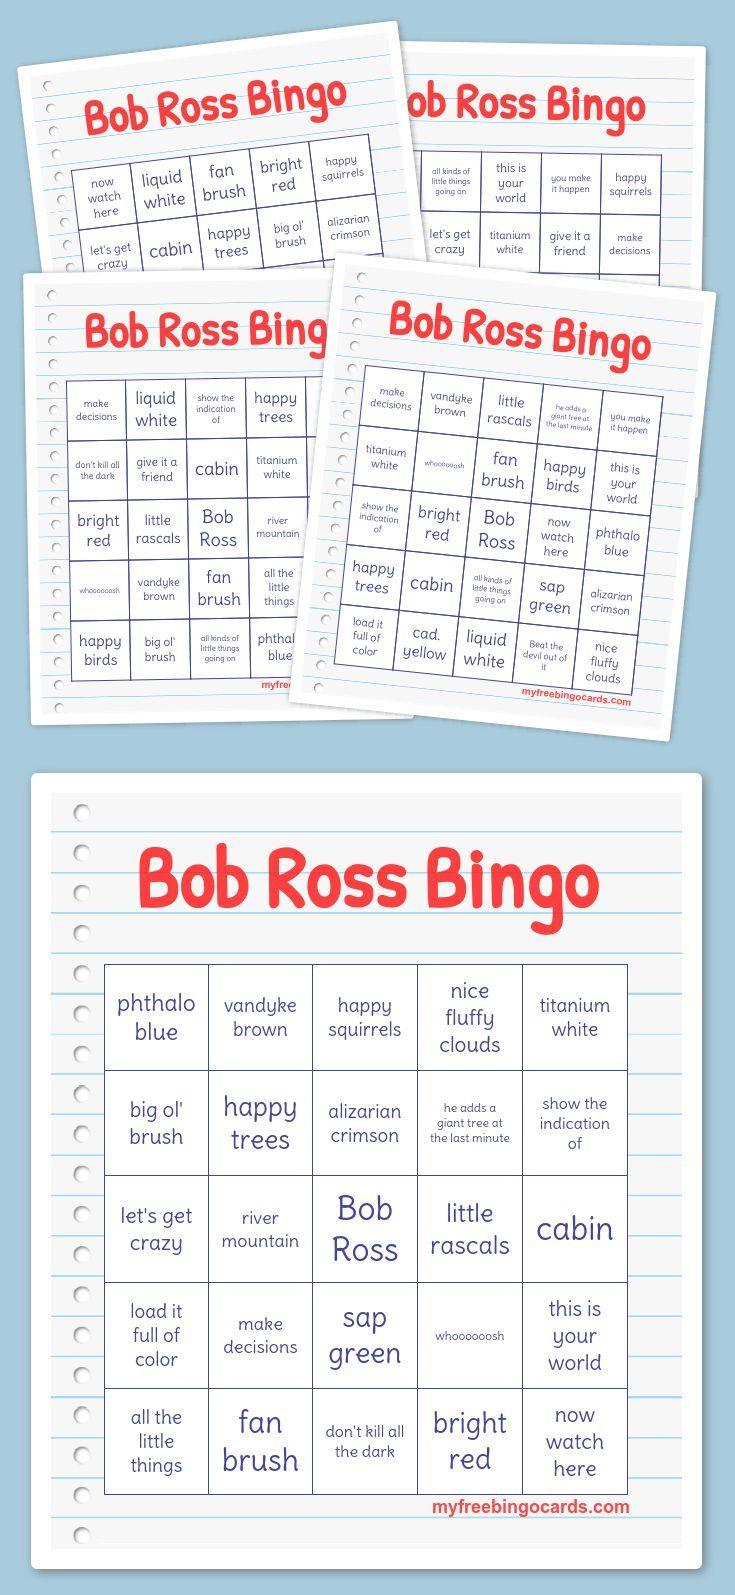 Bob Ross Bingo | Free Printable Bingo Cards, Bingo Cards